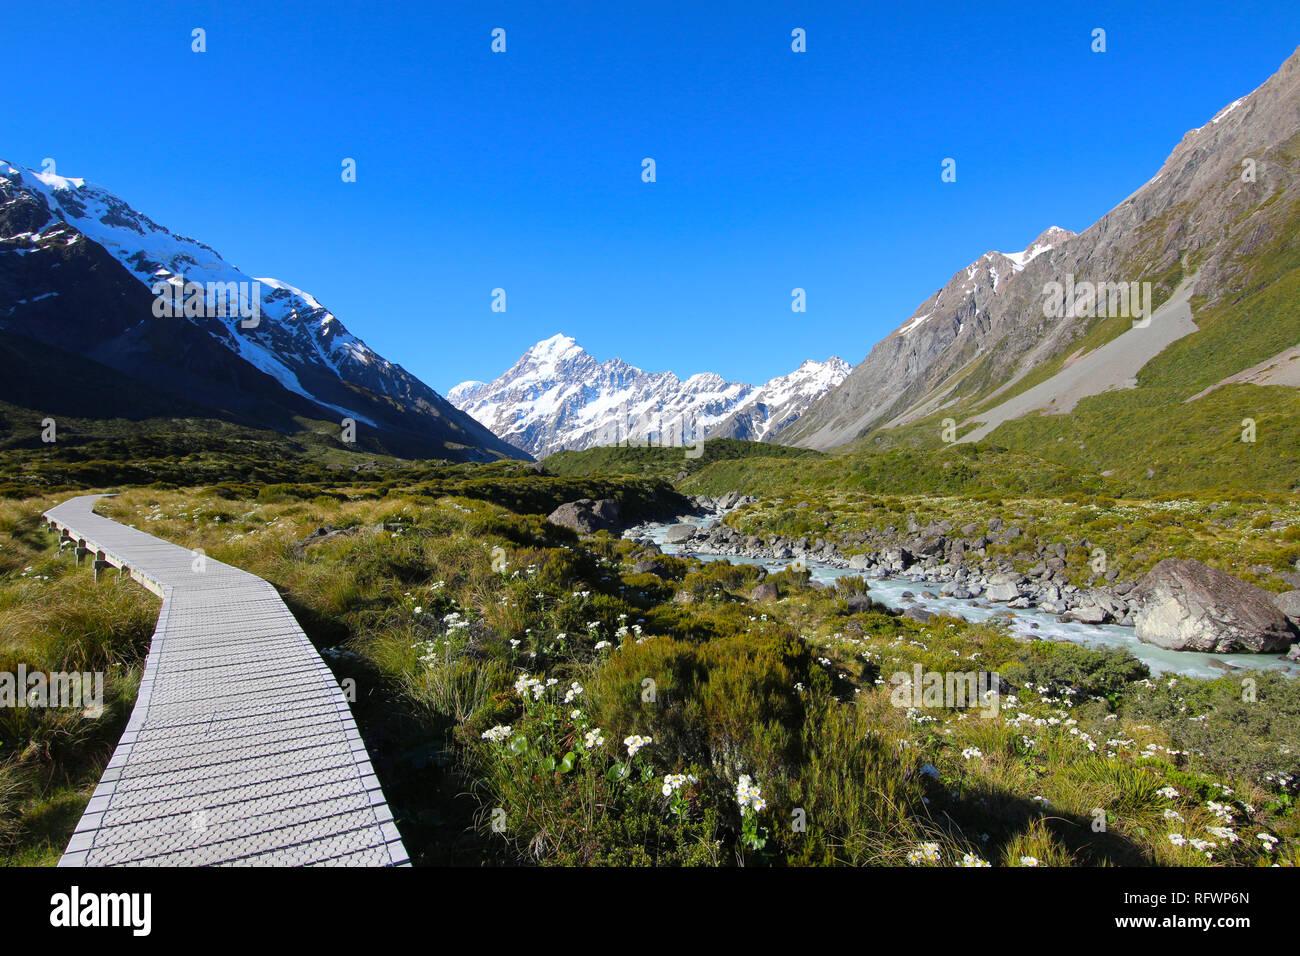 Aoraki / Mount Cook along the Hooker Valley Track, South Island, New Zealand - Stock Image